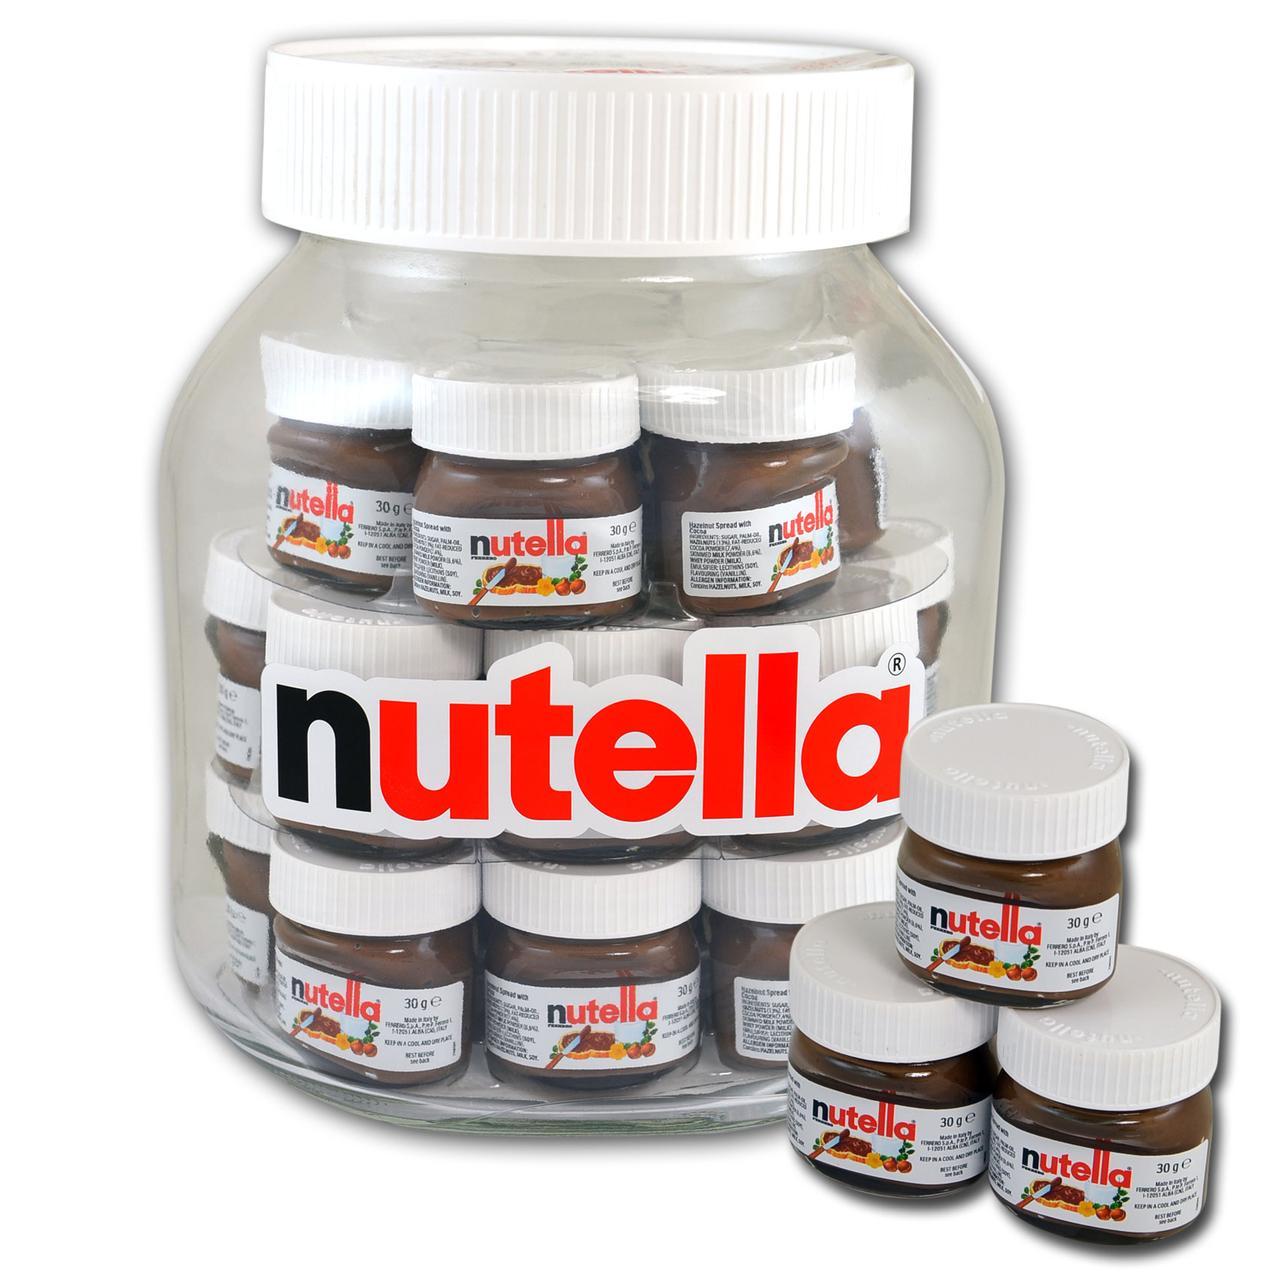 Nutella Hello World